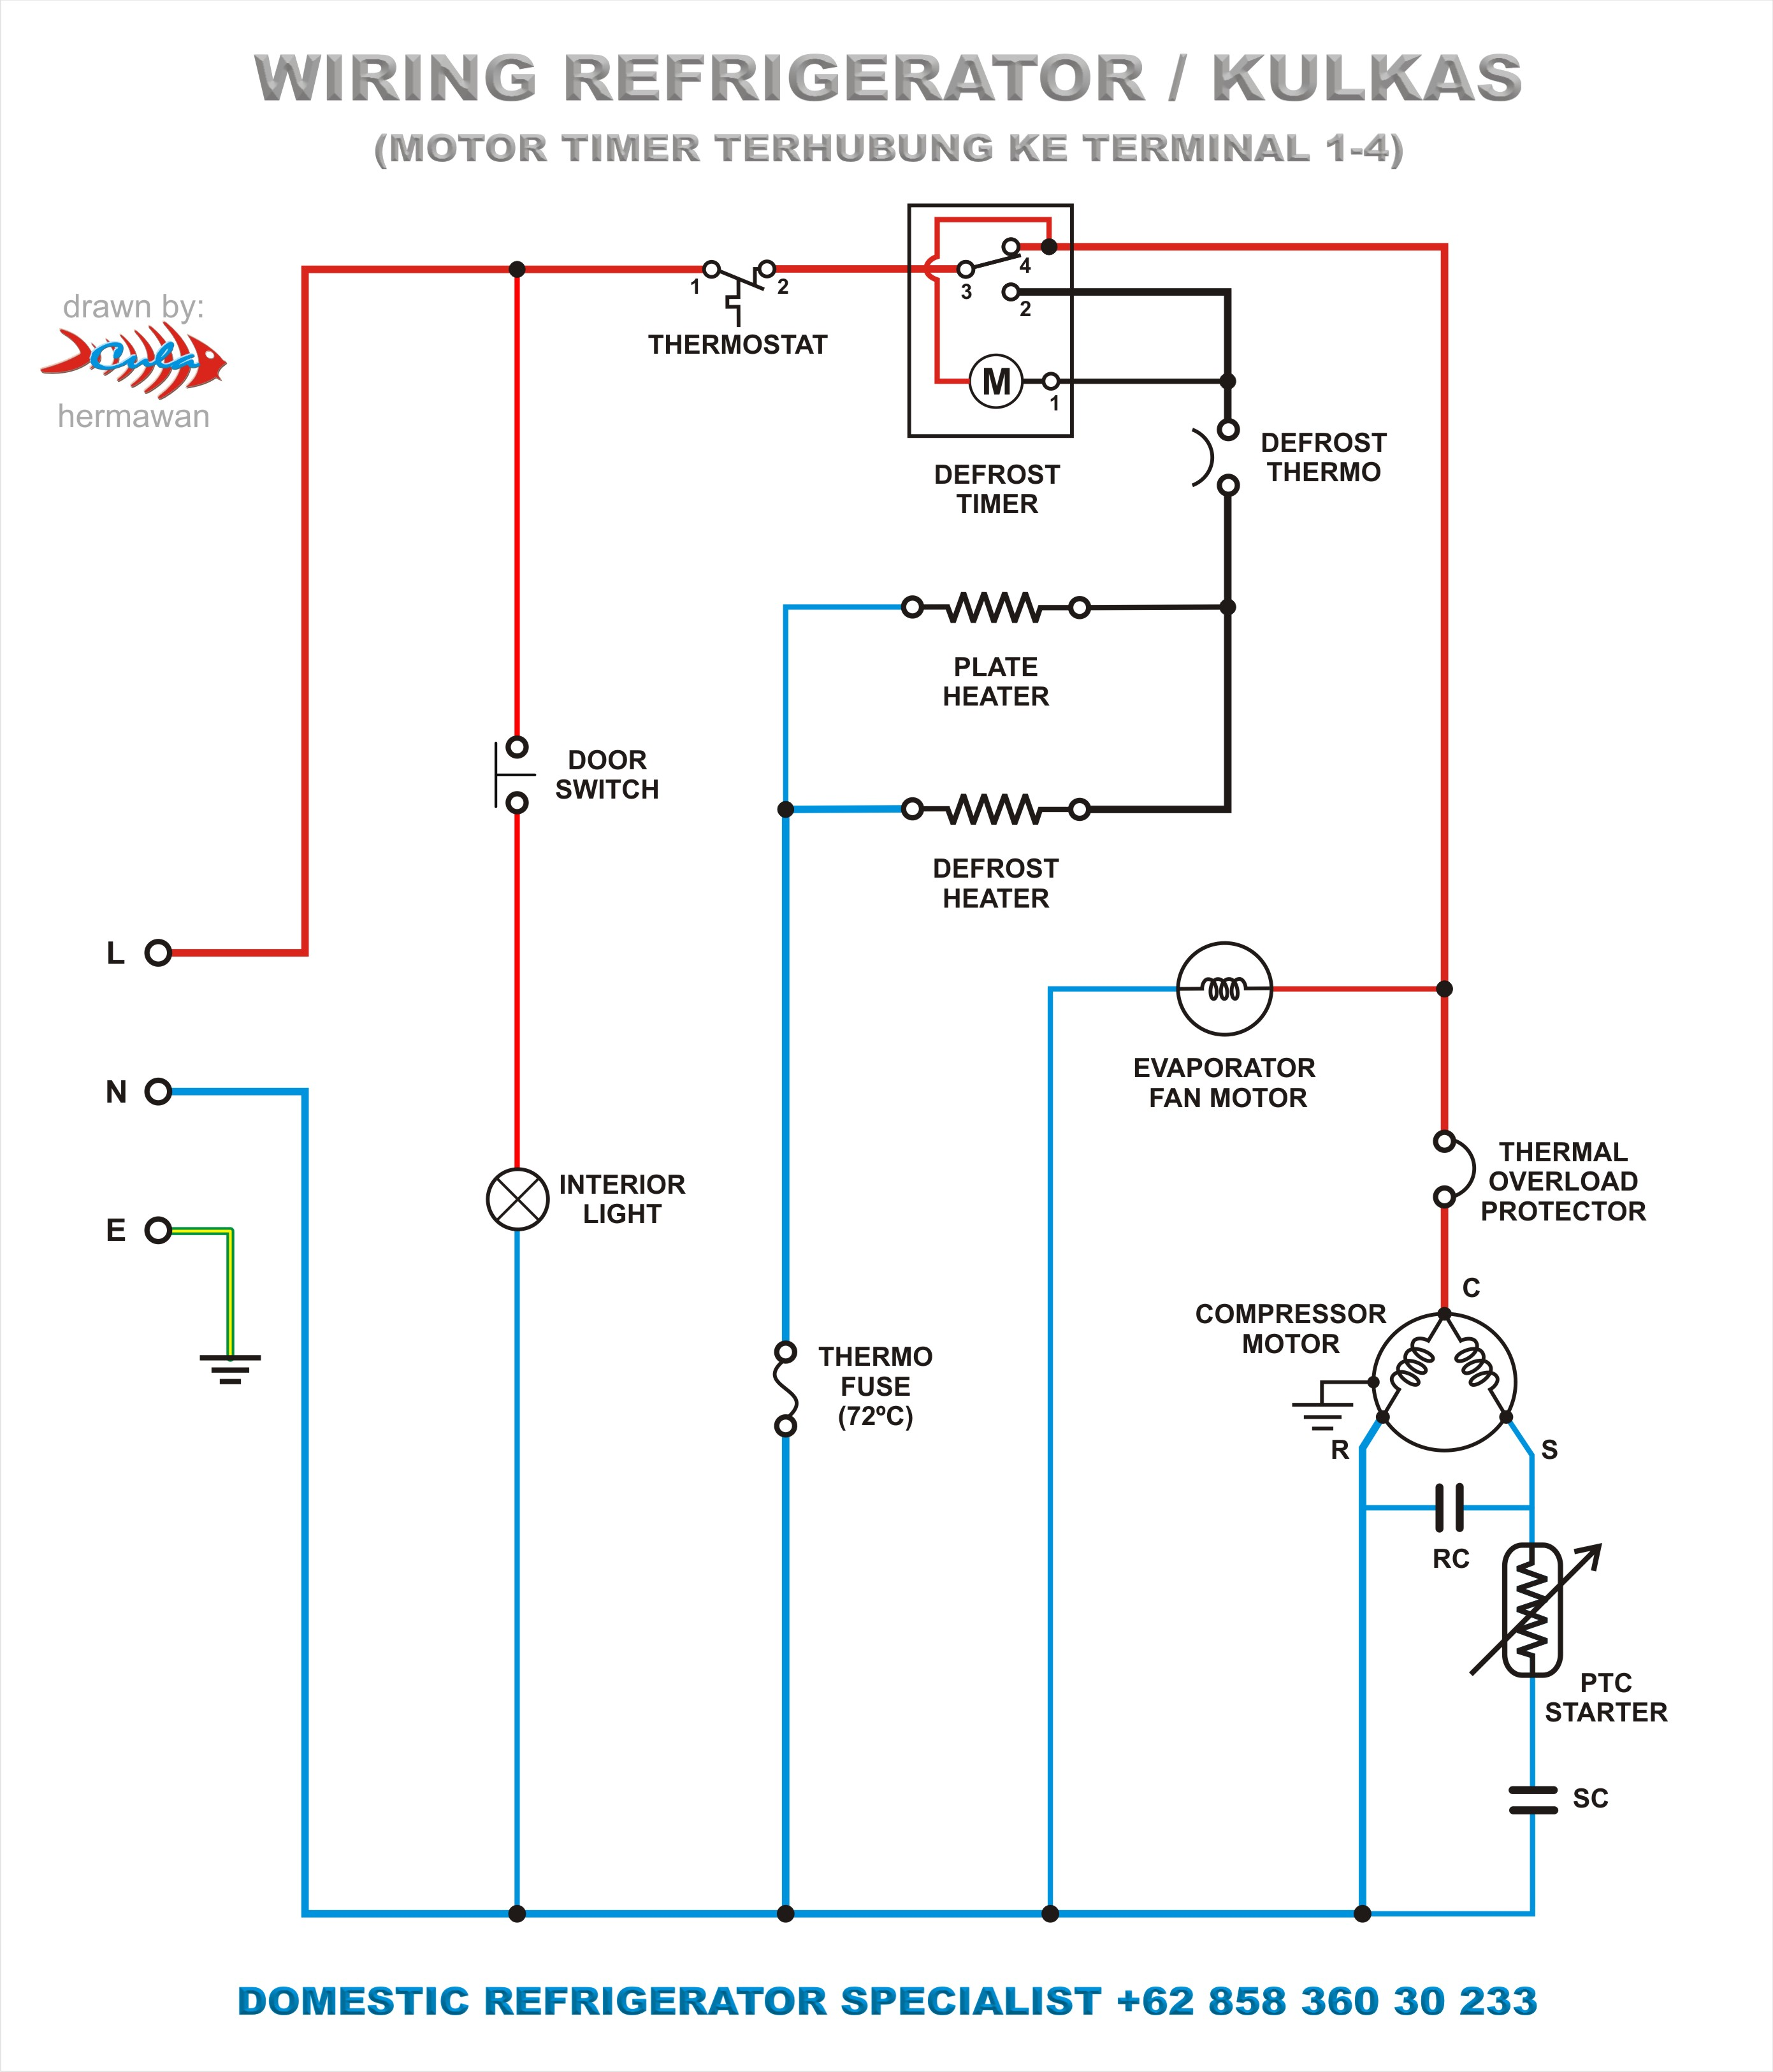 diagram electrolux refrigerator wiring diagram full version hd quality wiring diagram diagramist andrearossato it